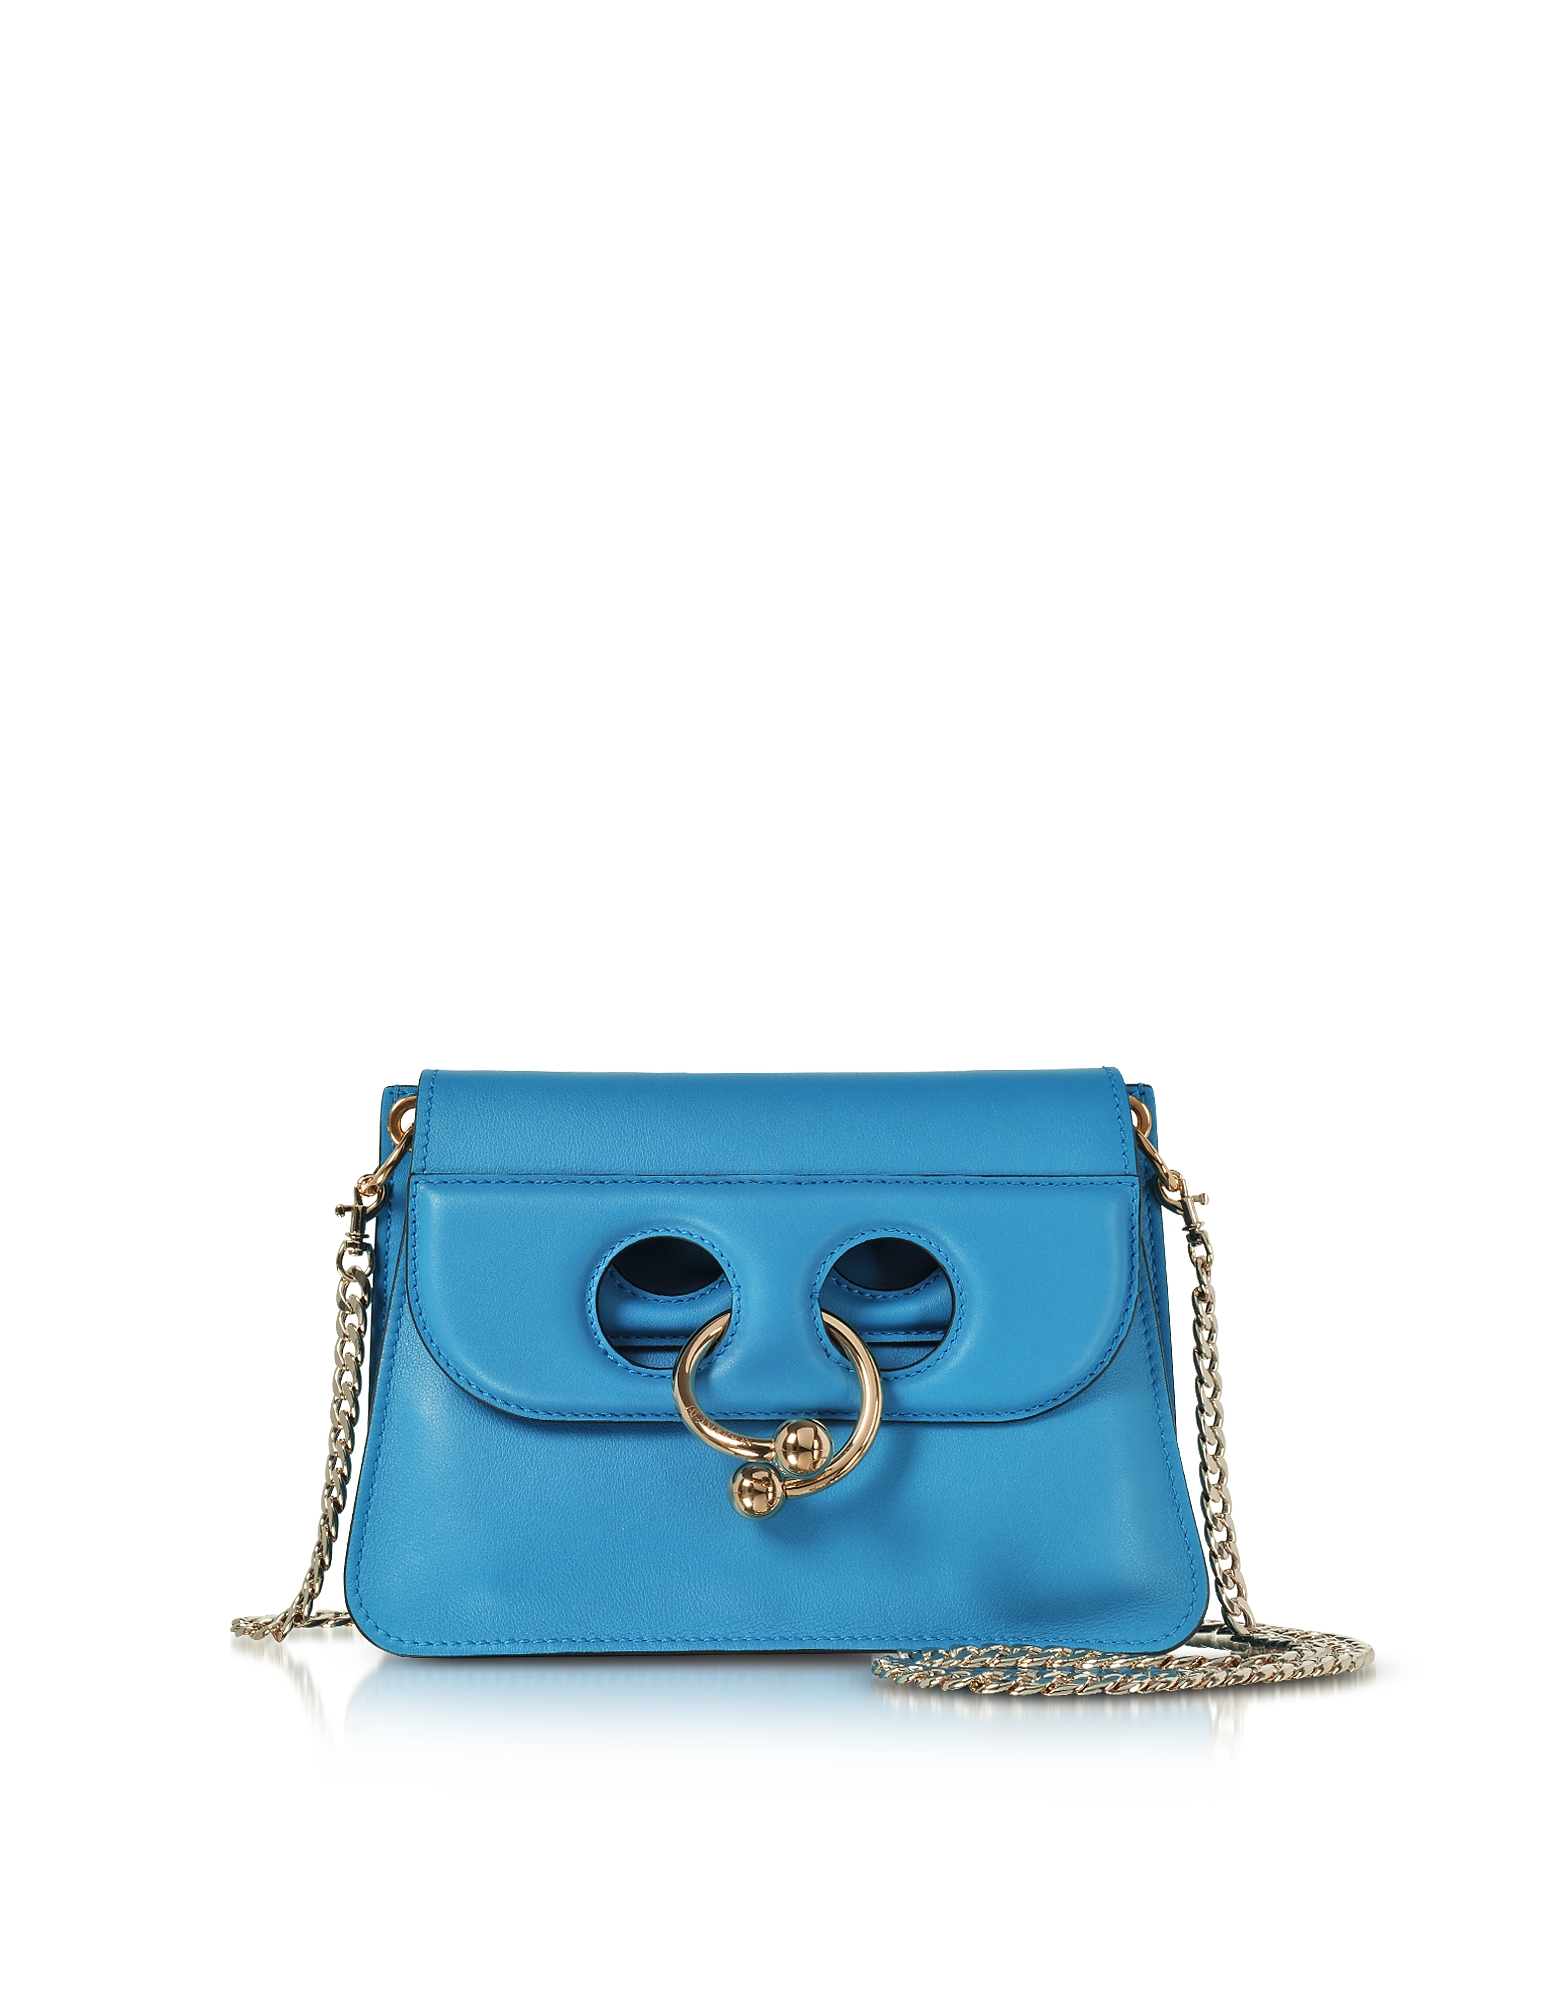 JW Anderson Handbags, Cerulean Blue Leather Mini Pierce Bag